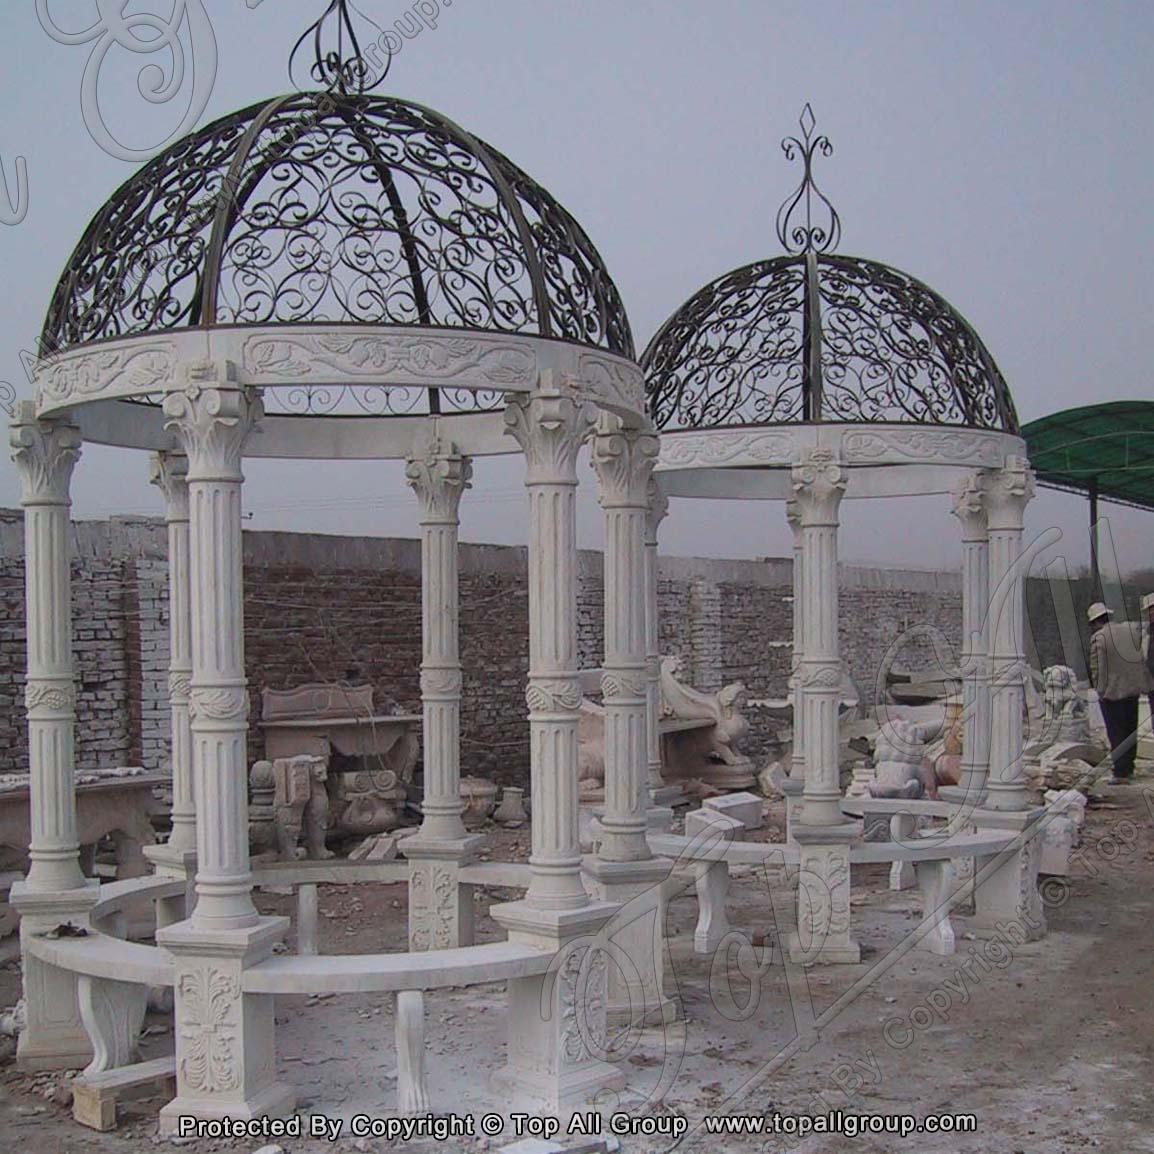 Outdoor luxury garden Marble gazebo